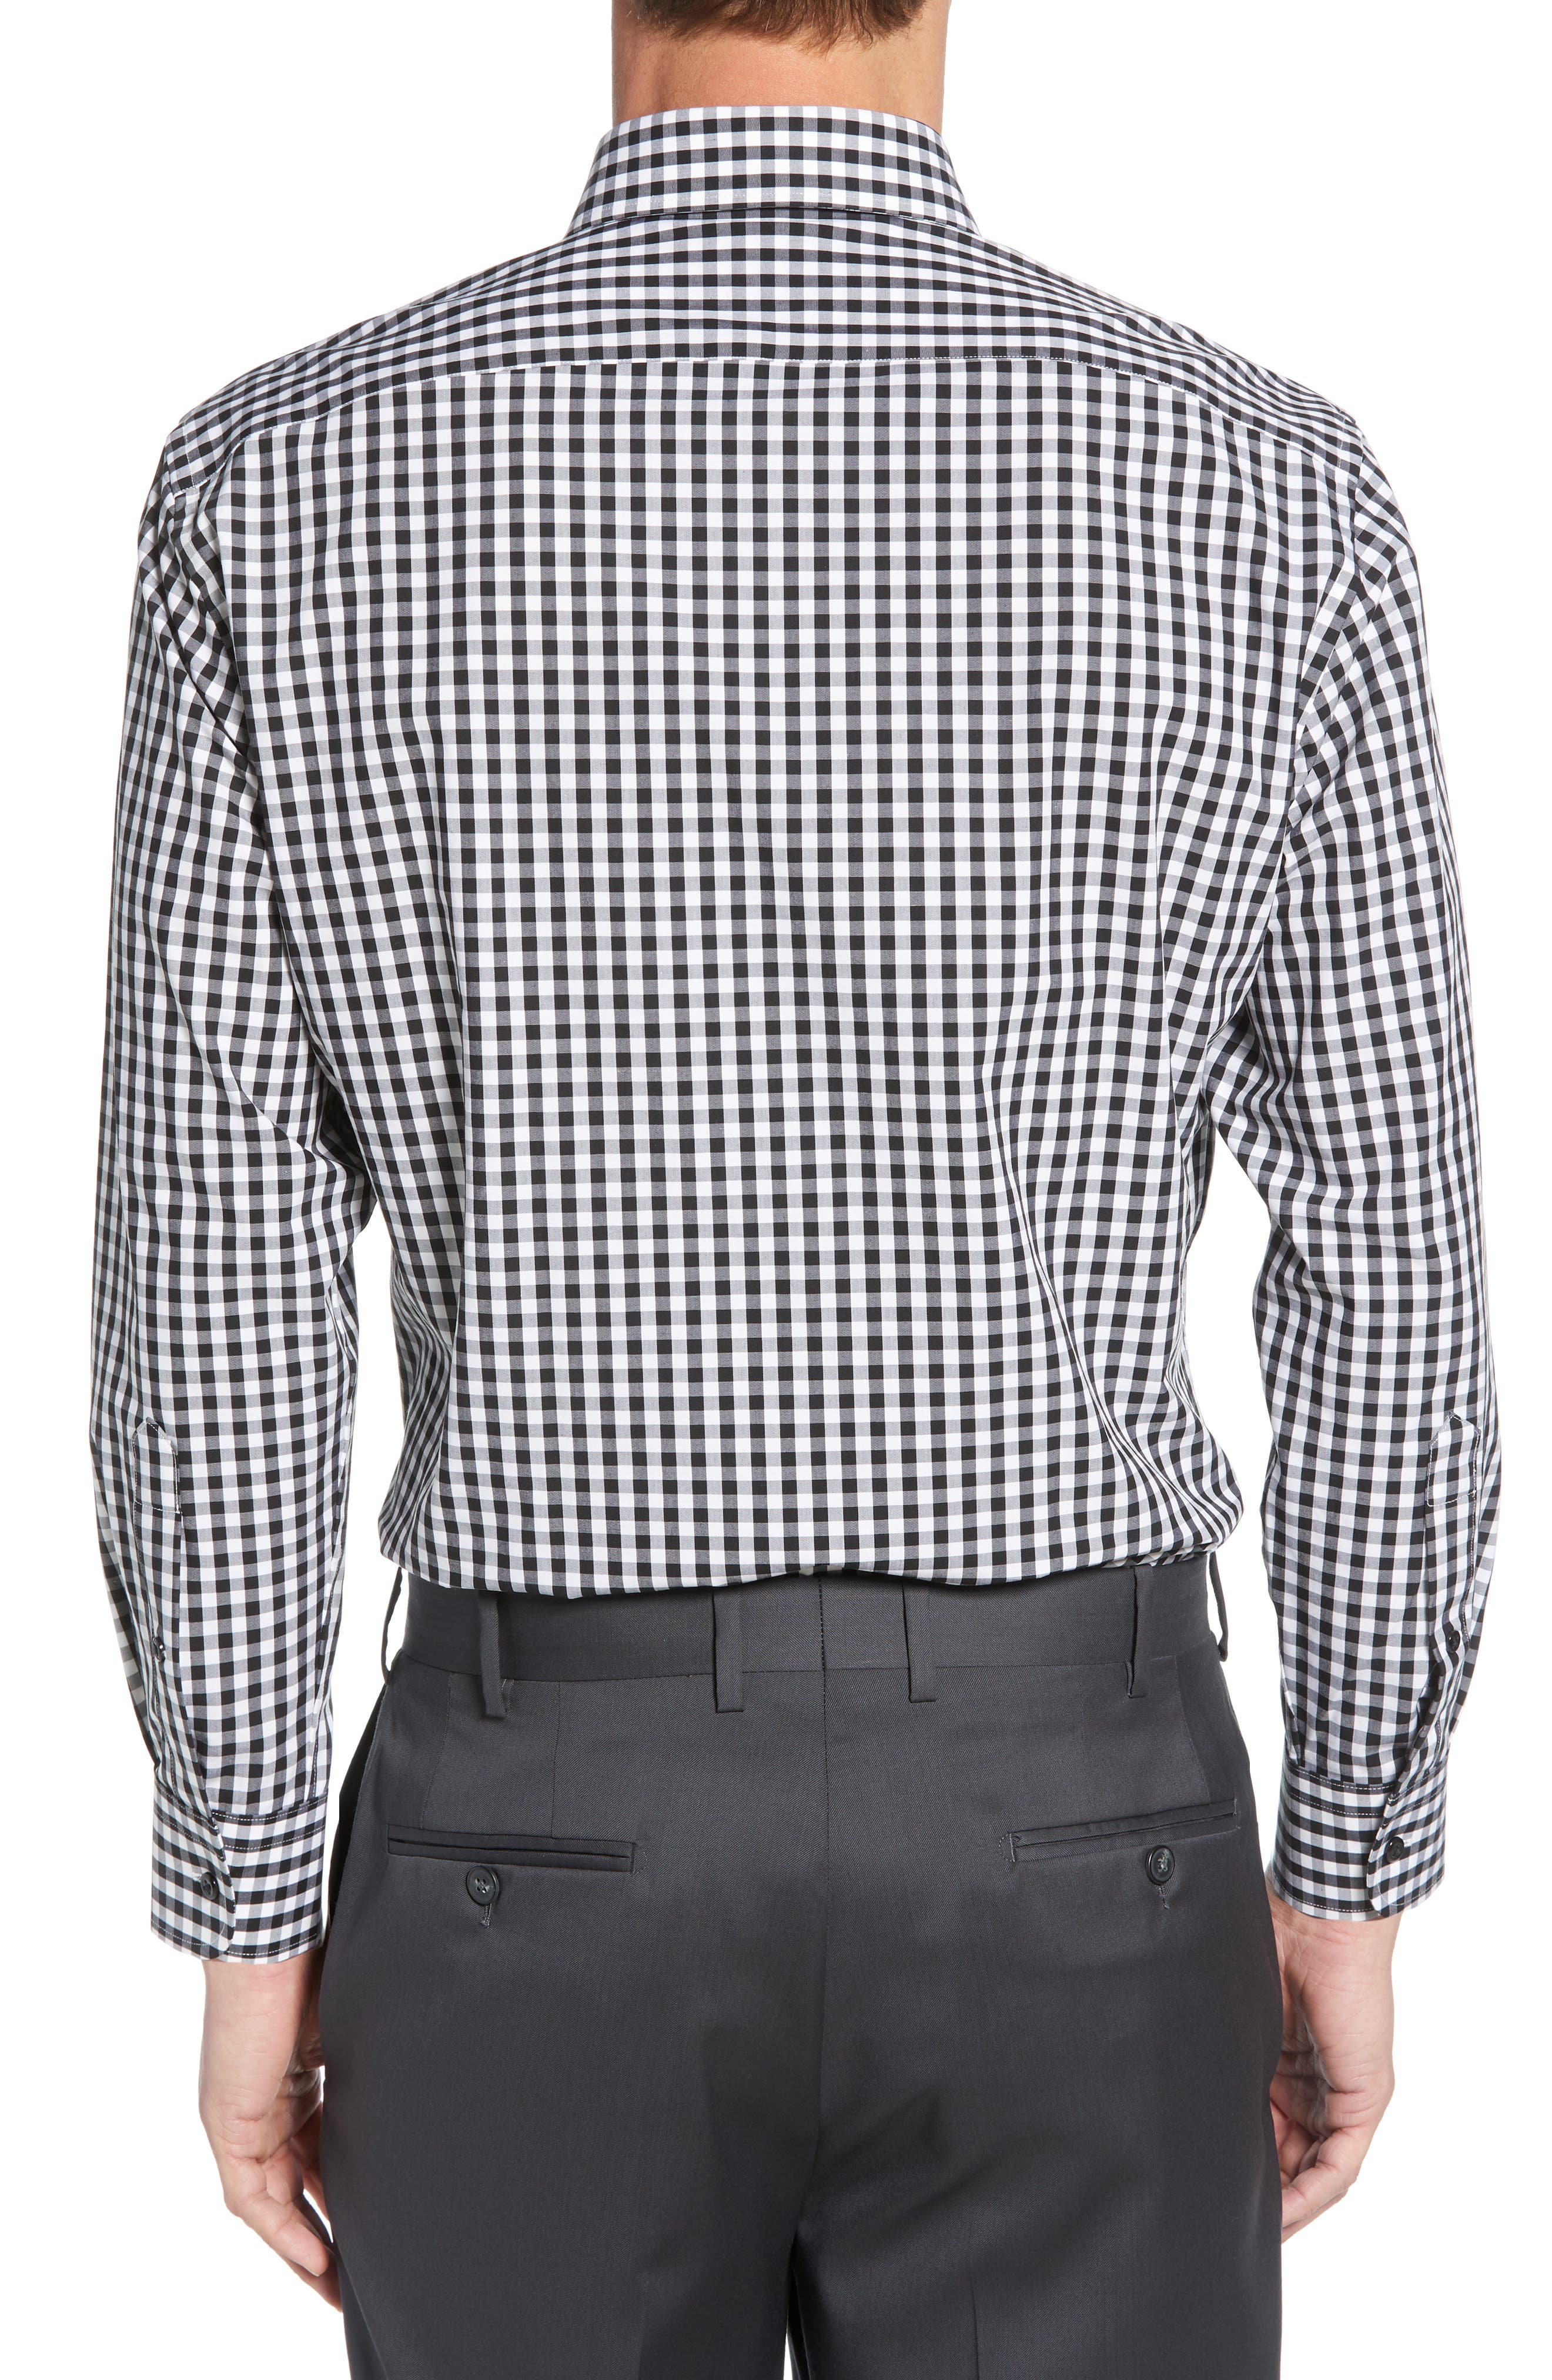 NORDSTROM MEN'S SHOP, Tech-Smart Traditional Fit Stretch Check Dress Shirt, Alternate thumbnail 3, color, BLACK ROCK